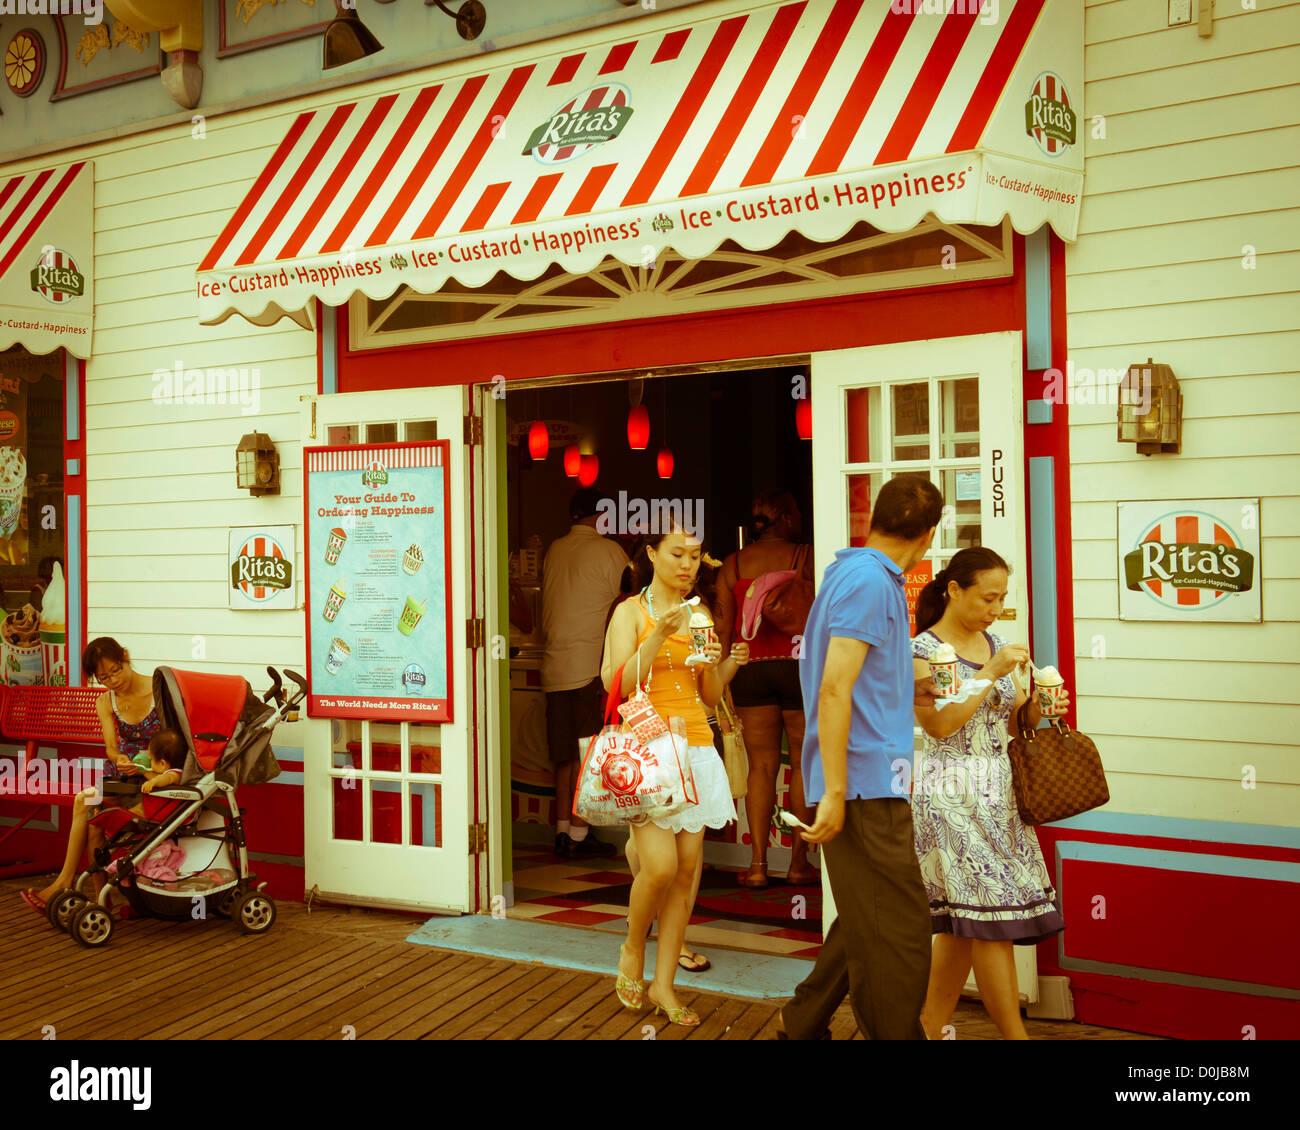 Tourists but ice cream on the boardwalk, Atlantic City, NJ Stock Photo